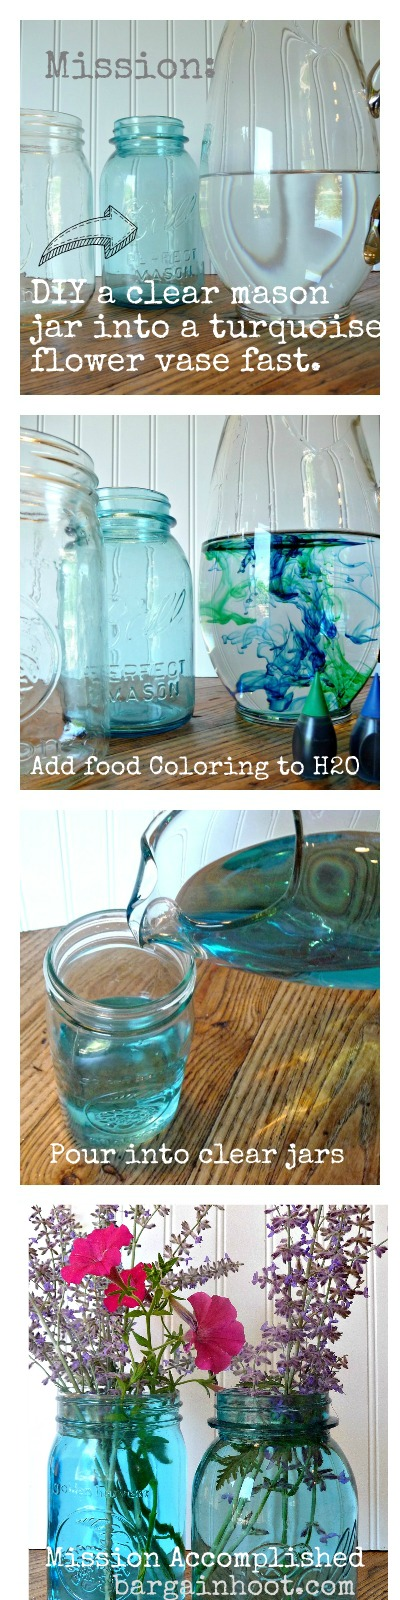 DIY Turquoise mason jar fast